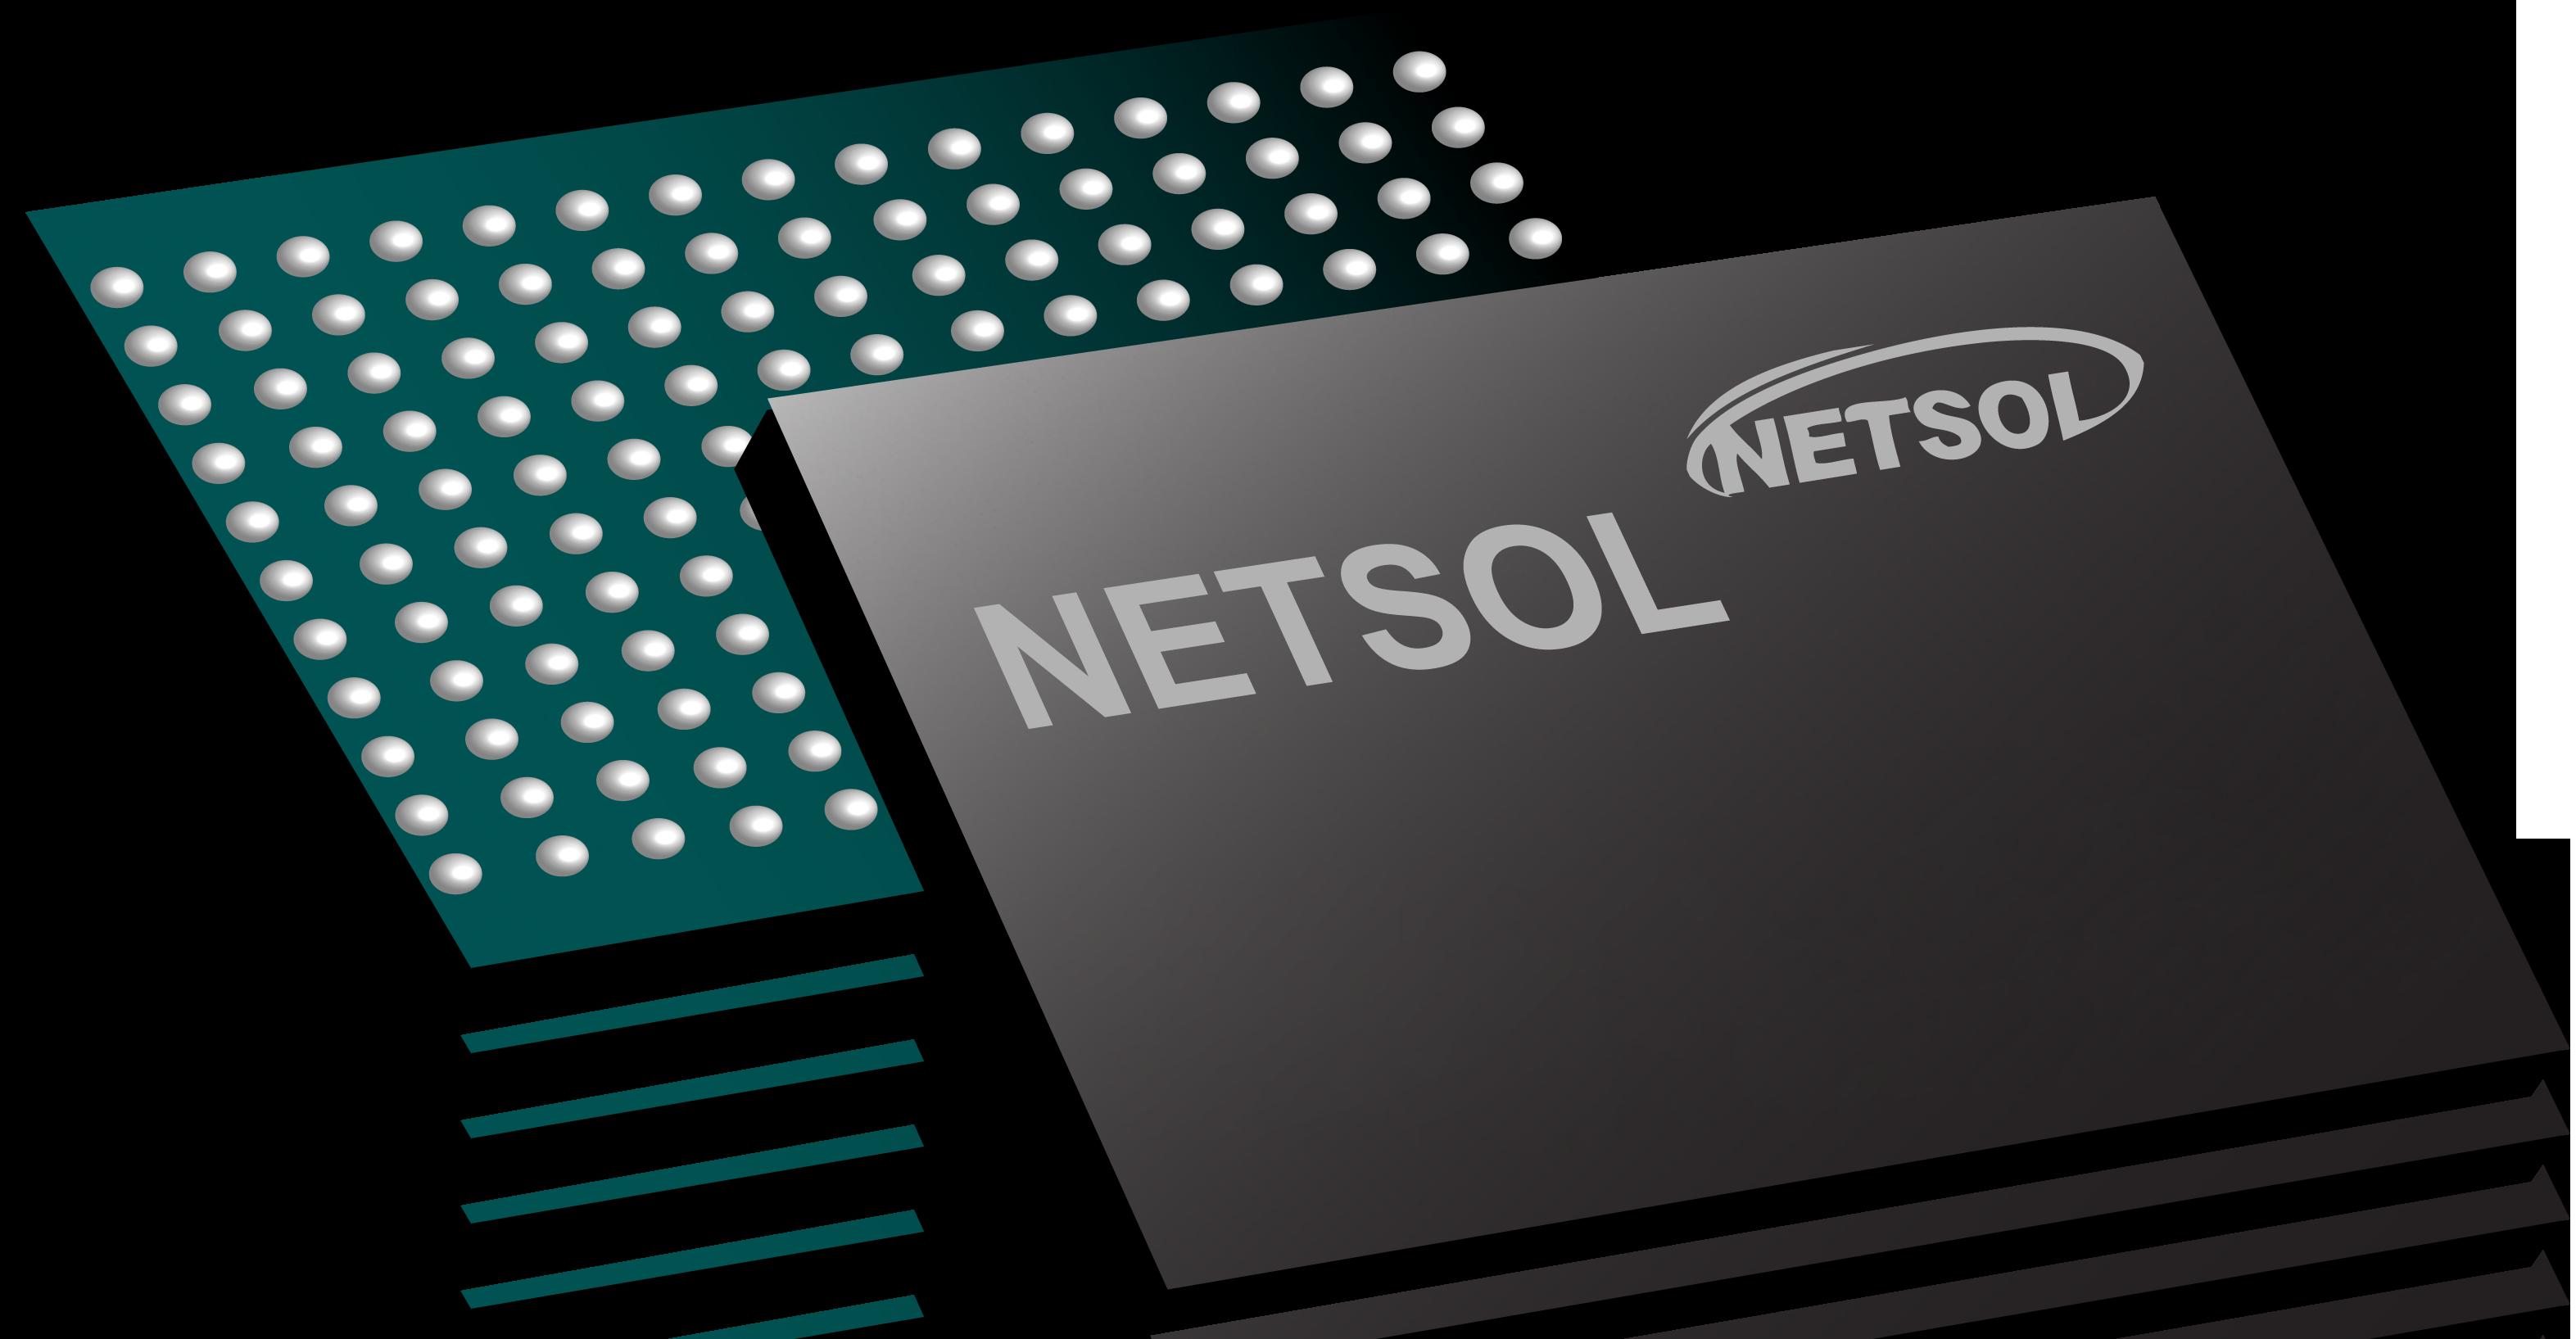 S7K6436T2M-EI40 | NETSOL